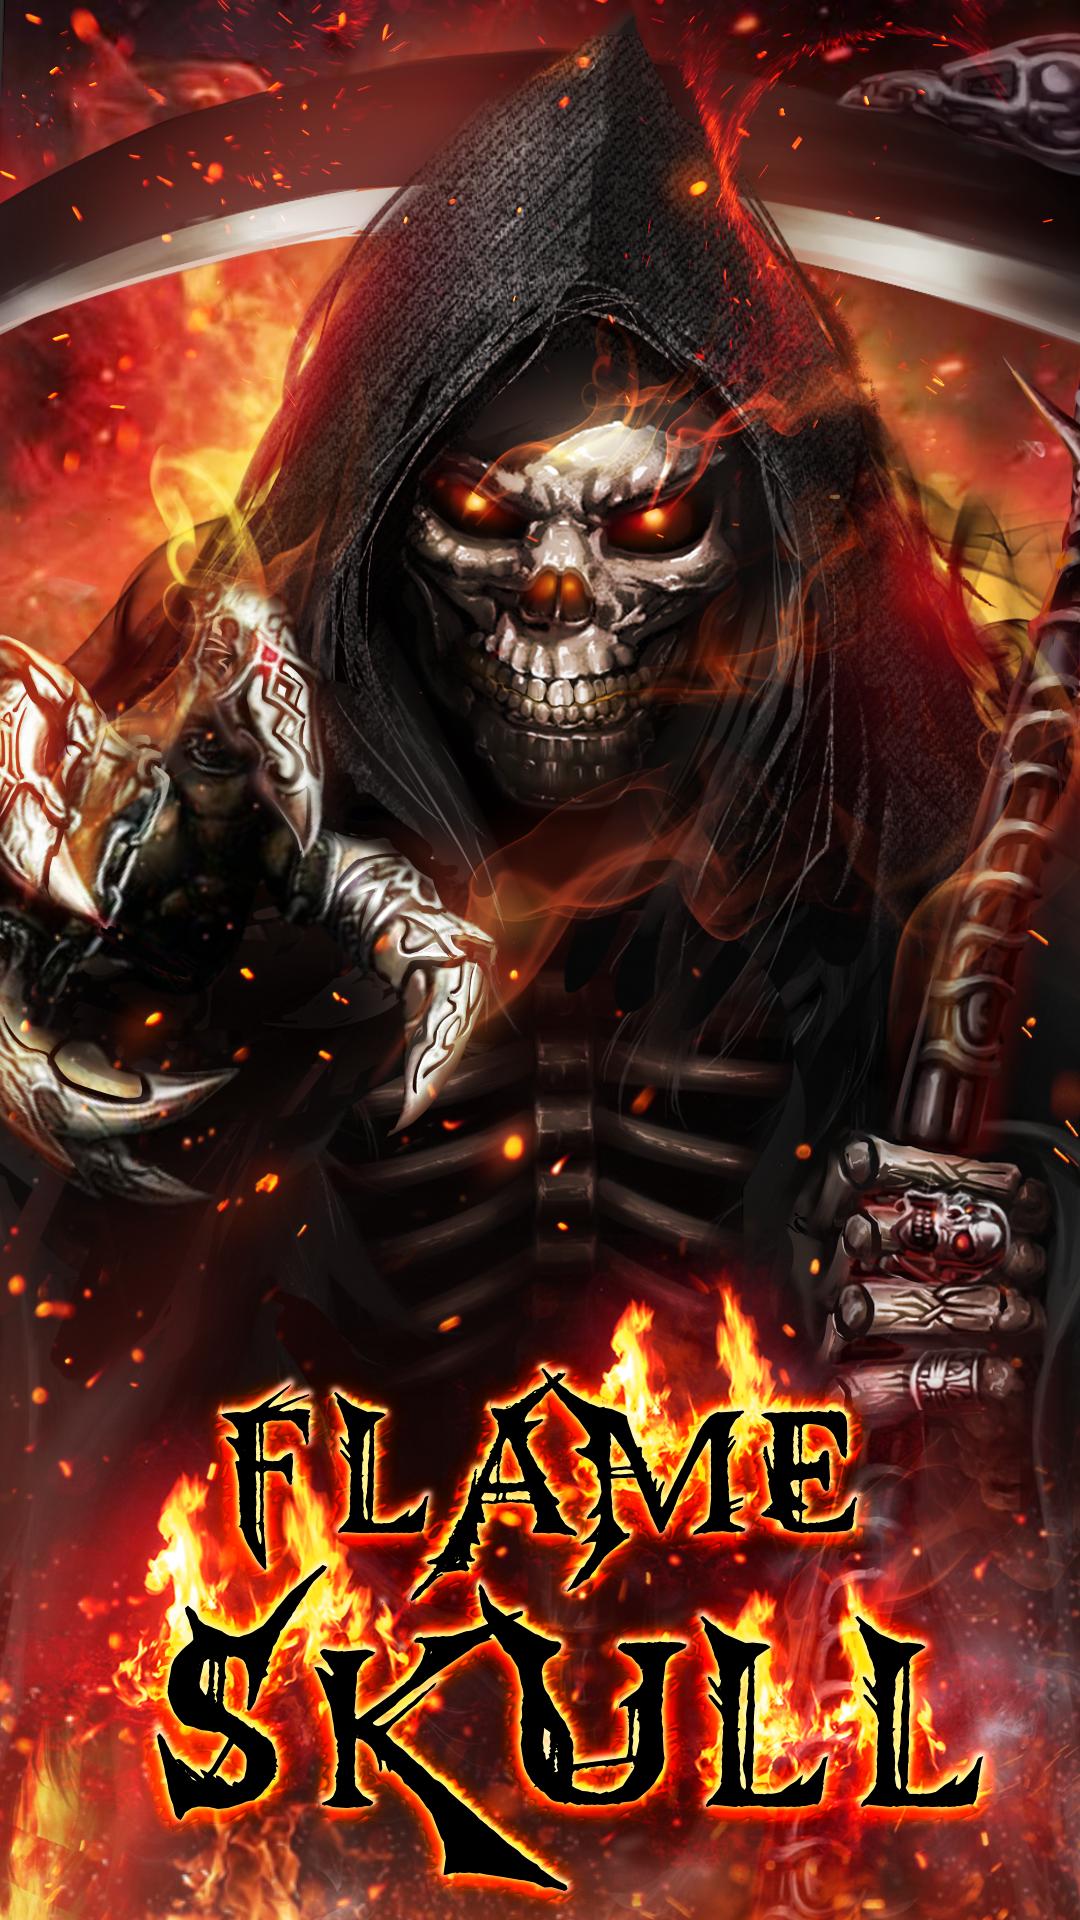 Flame skull live wallpaper! Skull wallpaper, Hd skull